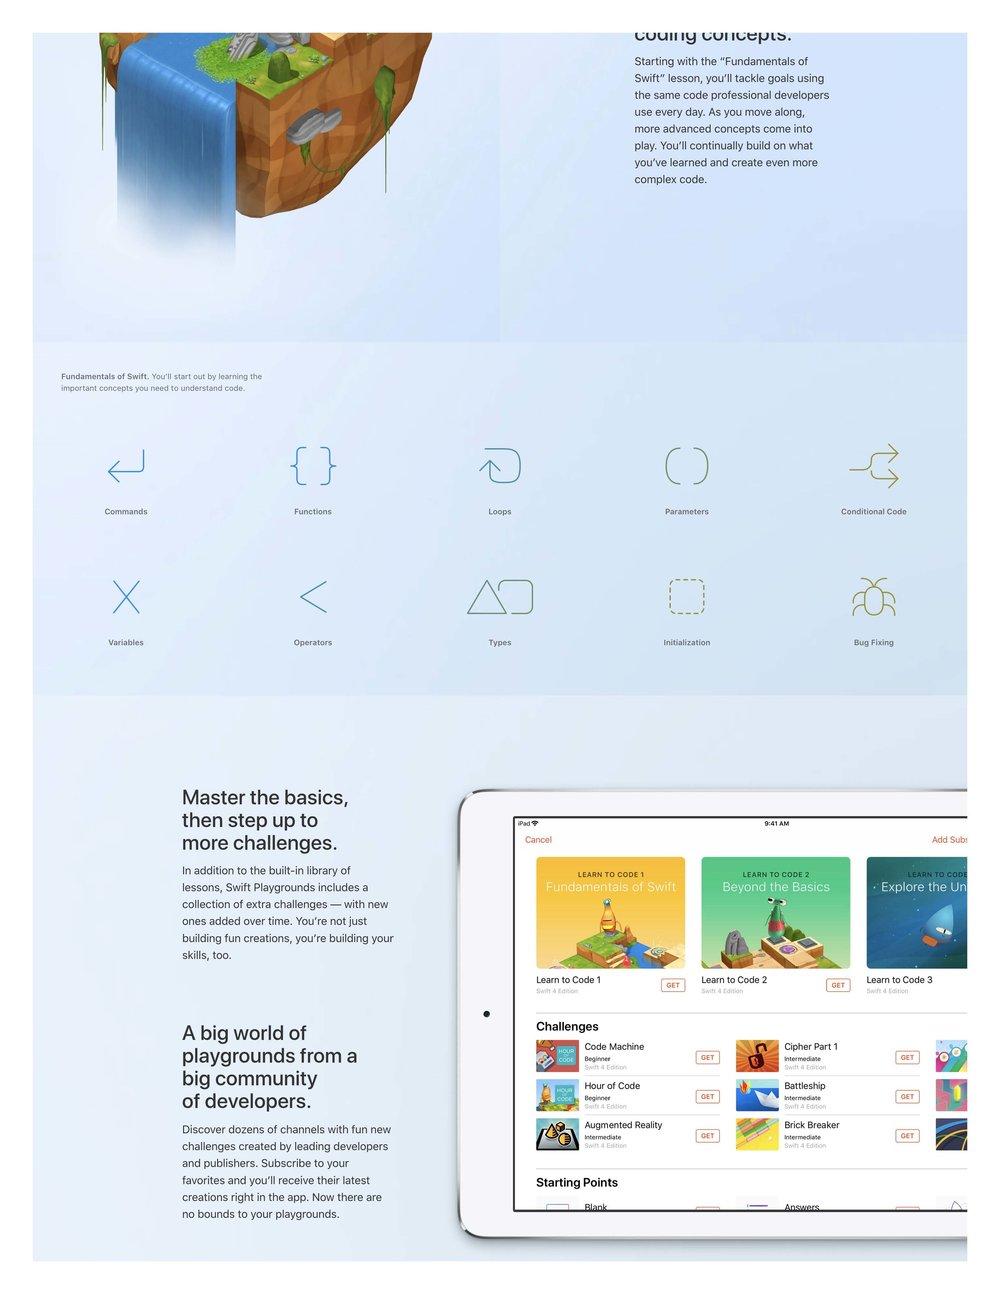 screencapture-apple-swift-playgrounds-2019-03-10-12_50_37_Page_3.jpg